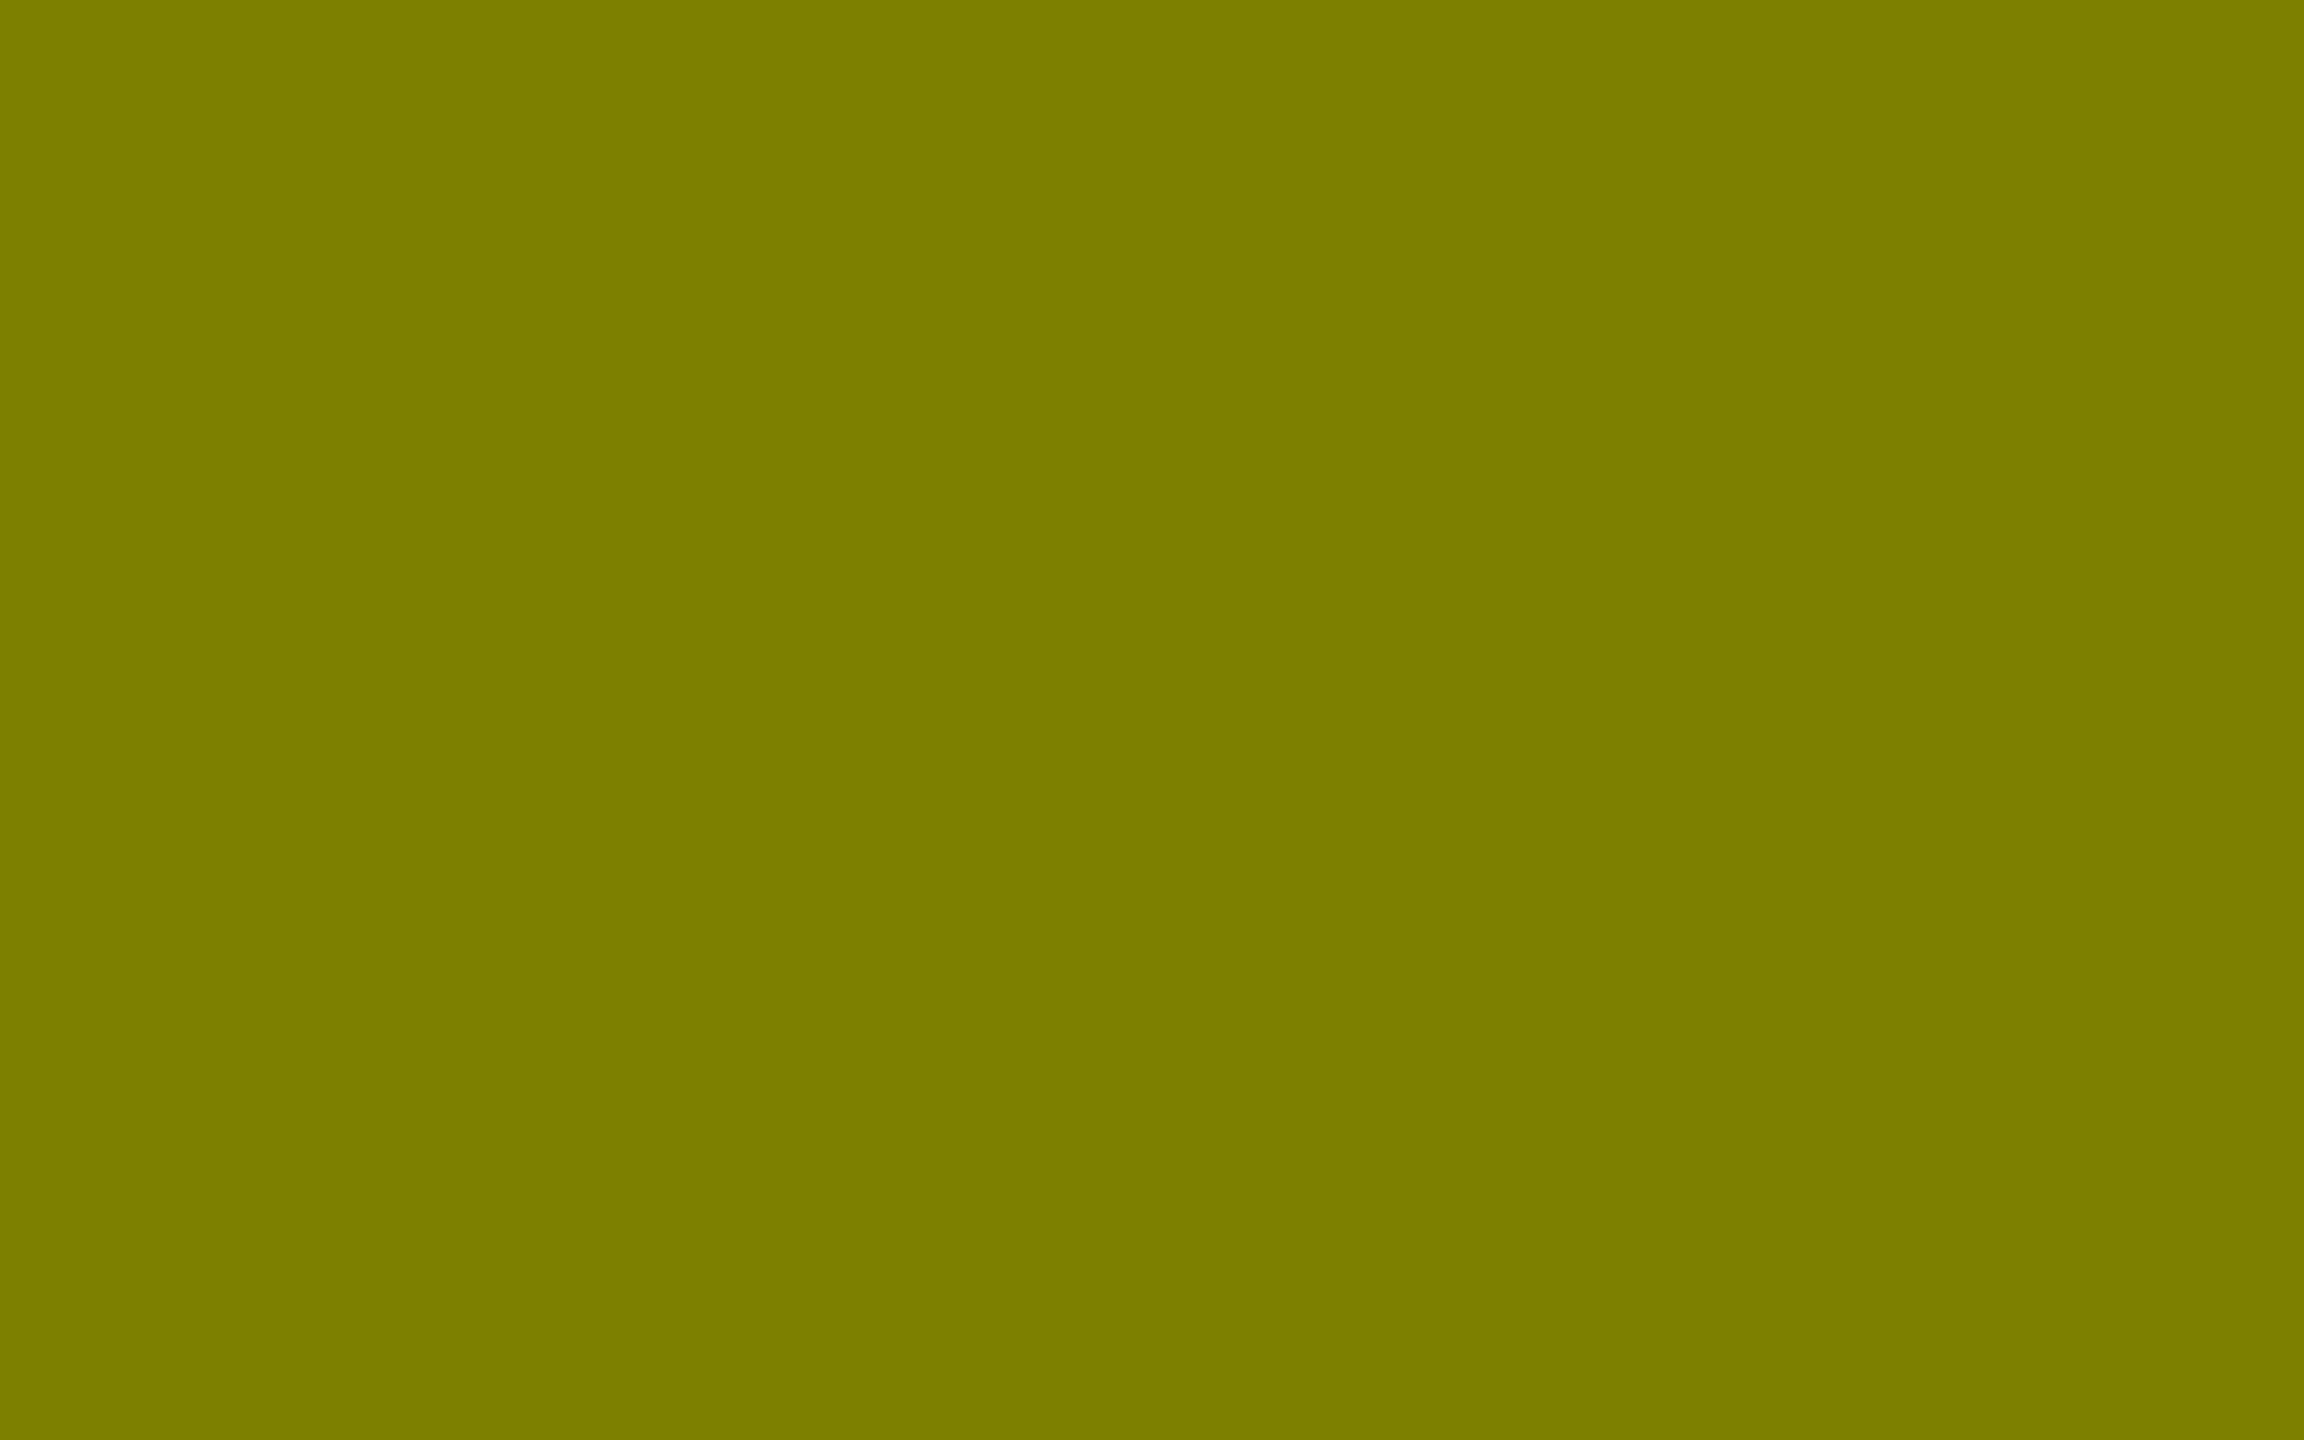 2304x1440 Olive Solid Color Background